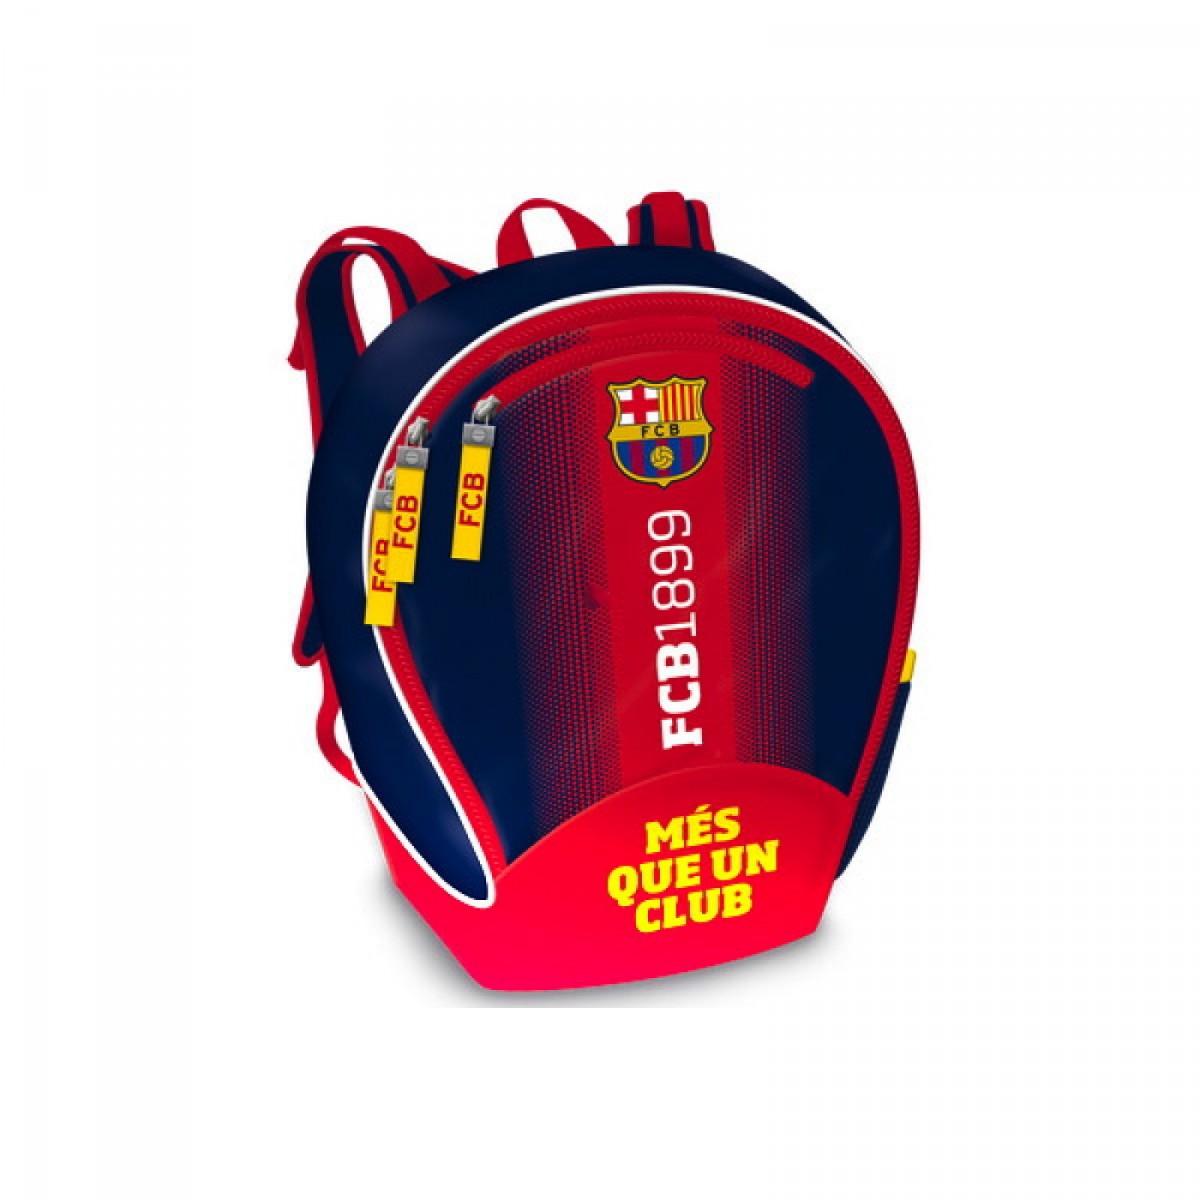 7a8aa6616d74 Barcelona ovis hátizsák fiú - AU-93196482 - - FC Barcelona   Játék ...